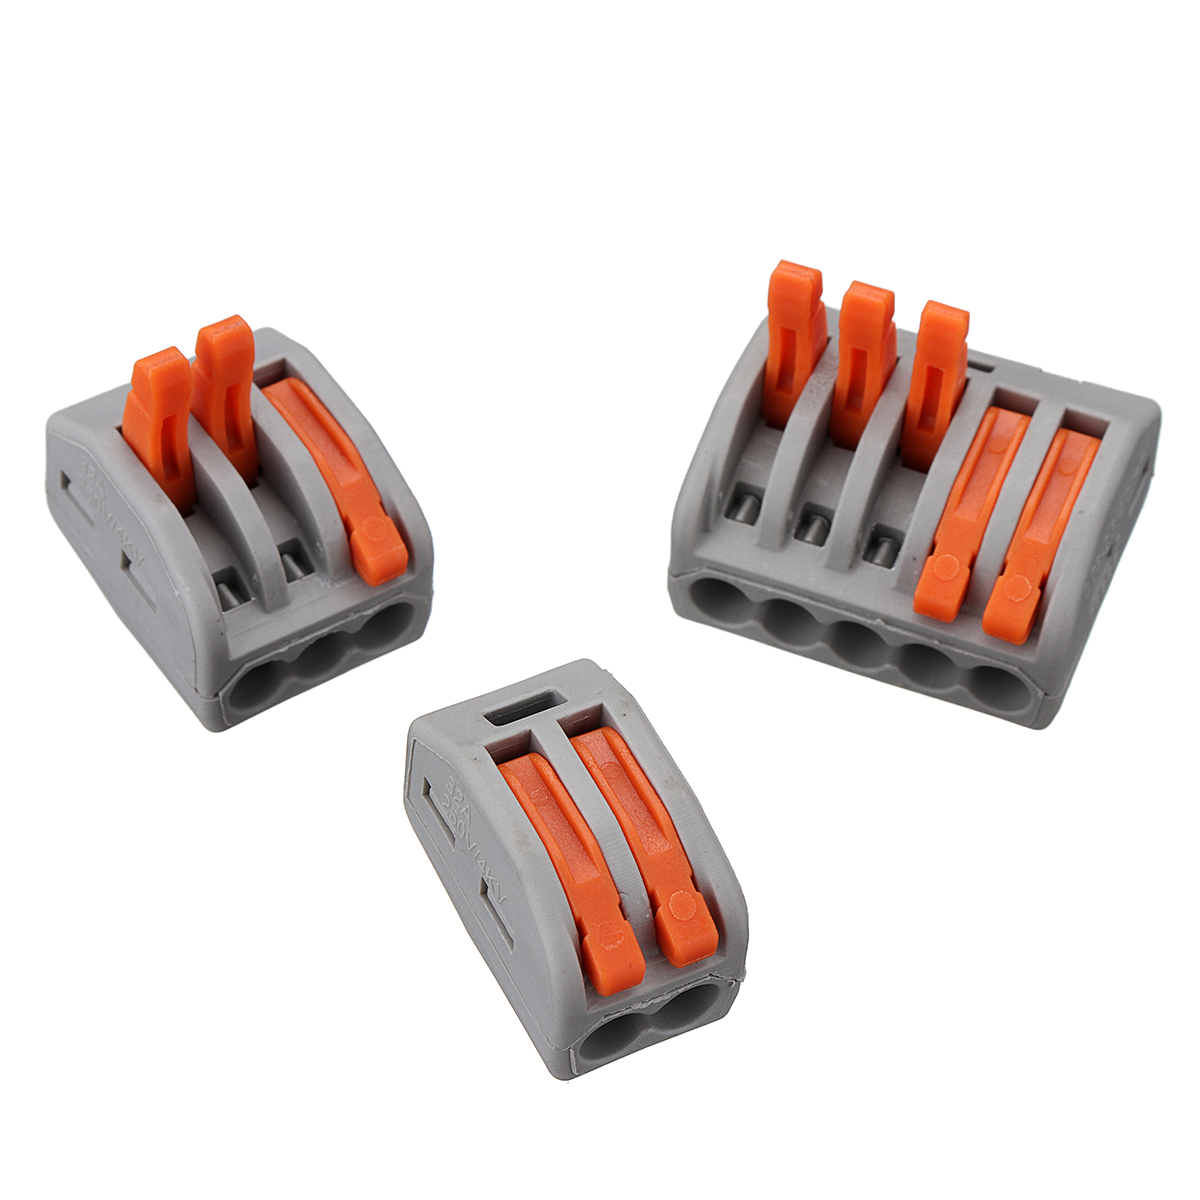 6011e7db 6eac 4ccb 9c9f 46f4b1cb1710 Excellway® 60Pcs 2/3/5 Holes Spring Conductor Terminal Block